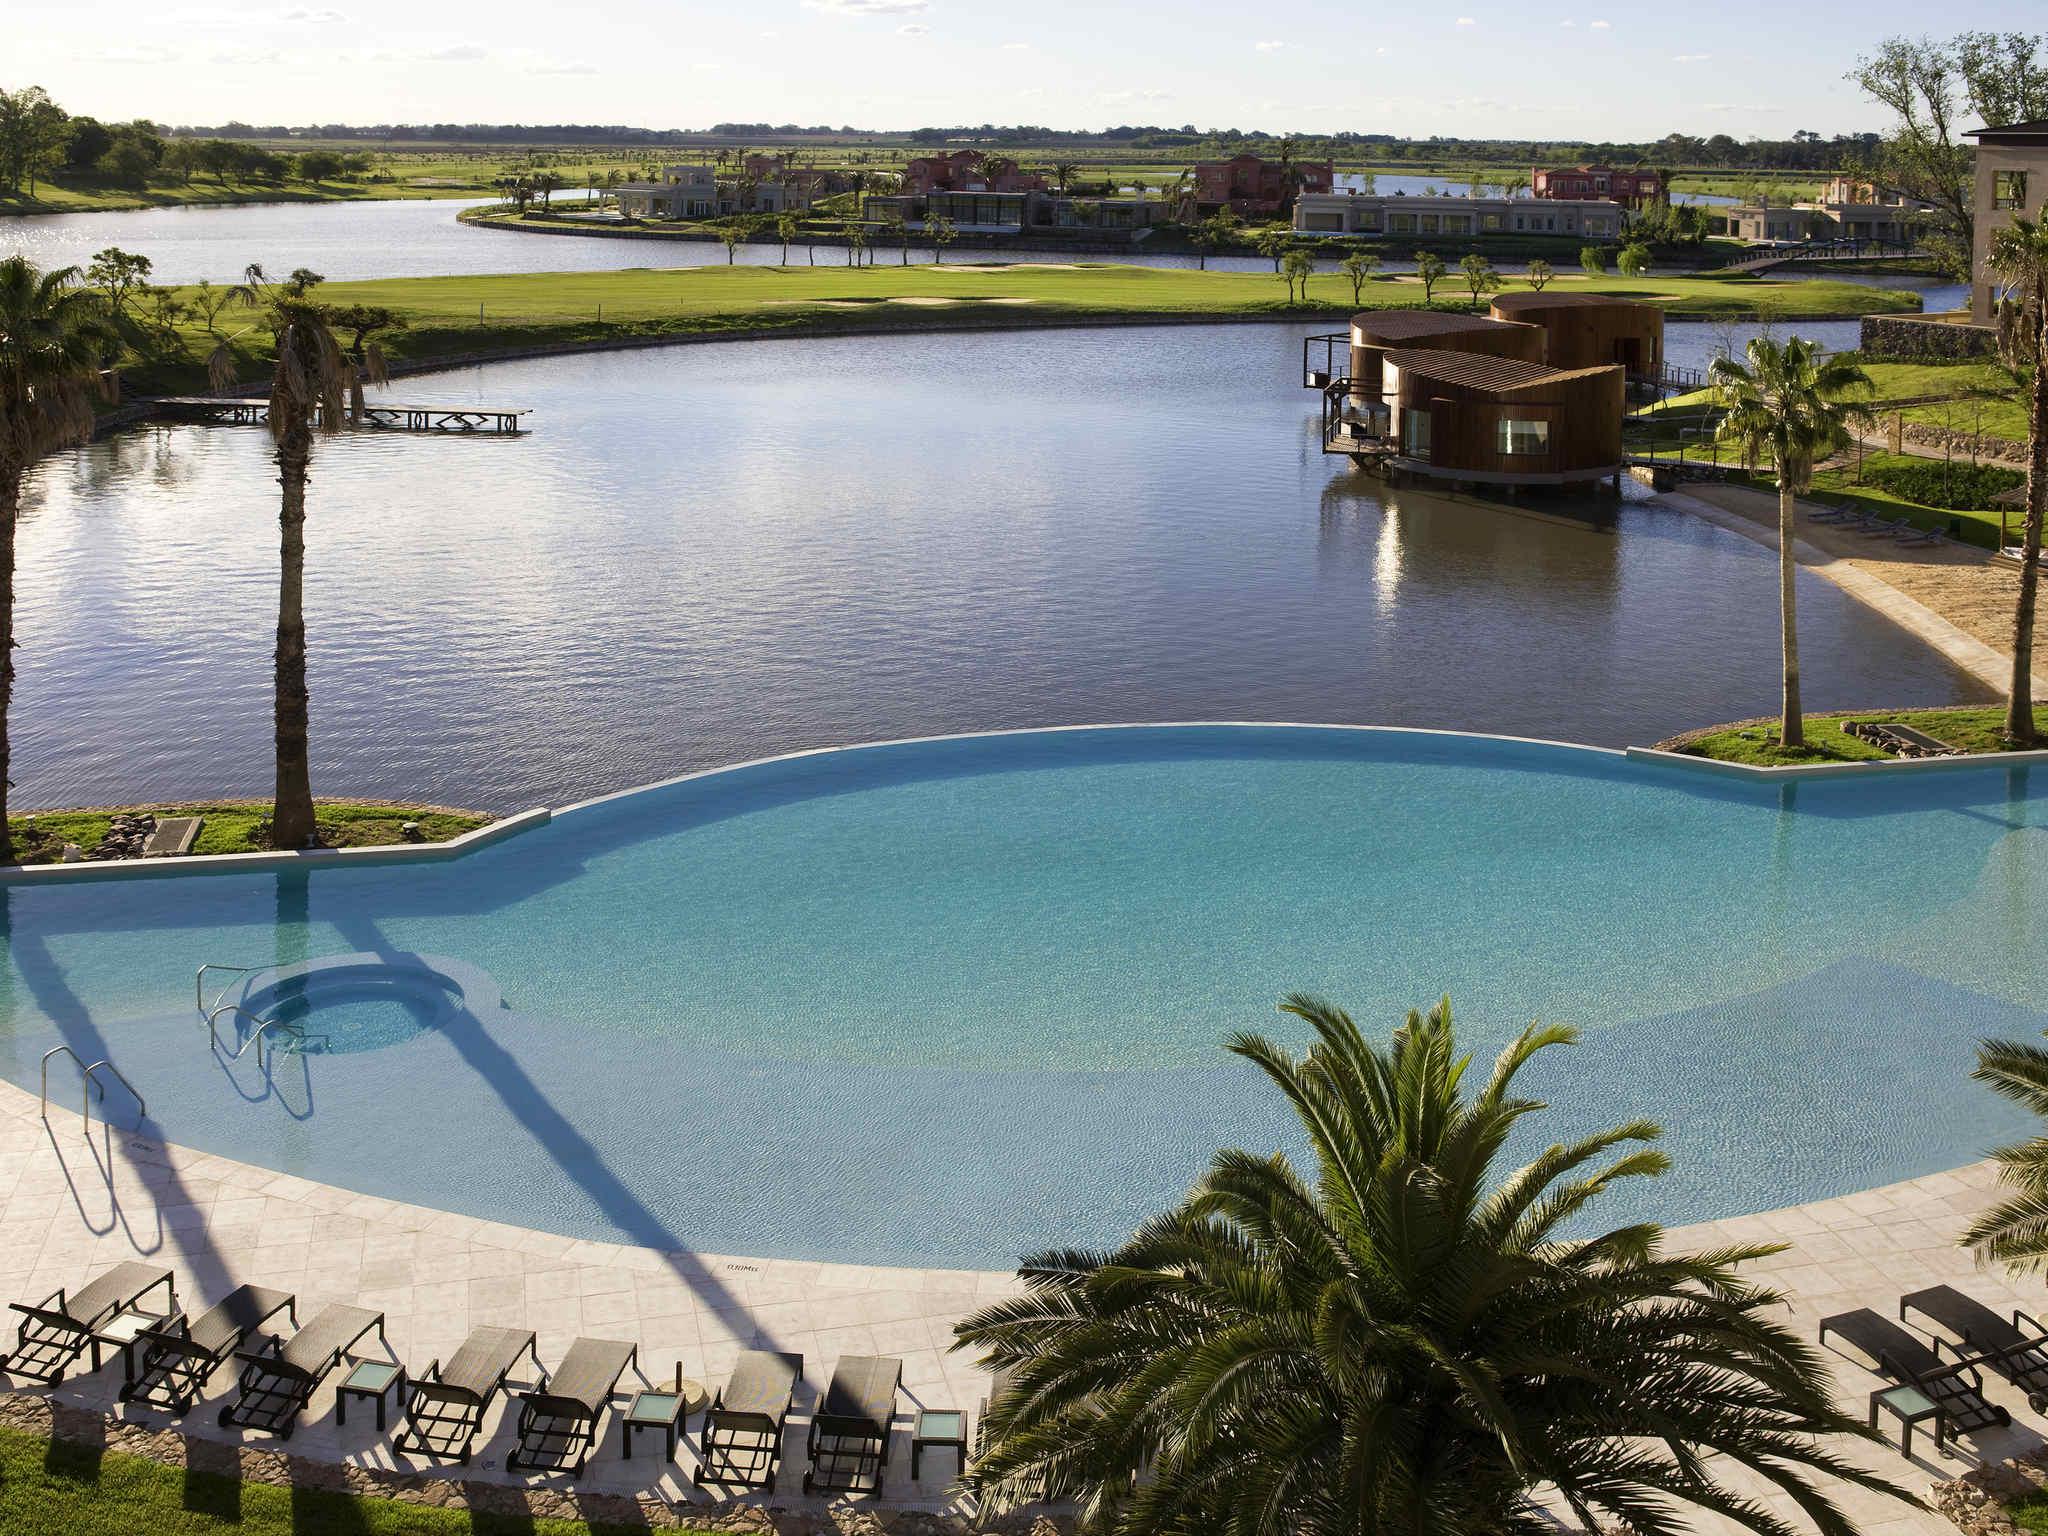 Hotel – Sofitel La Reserva Cardales